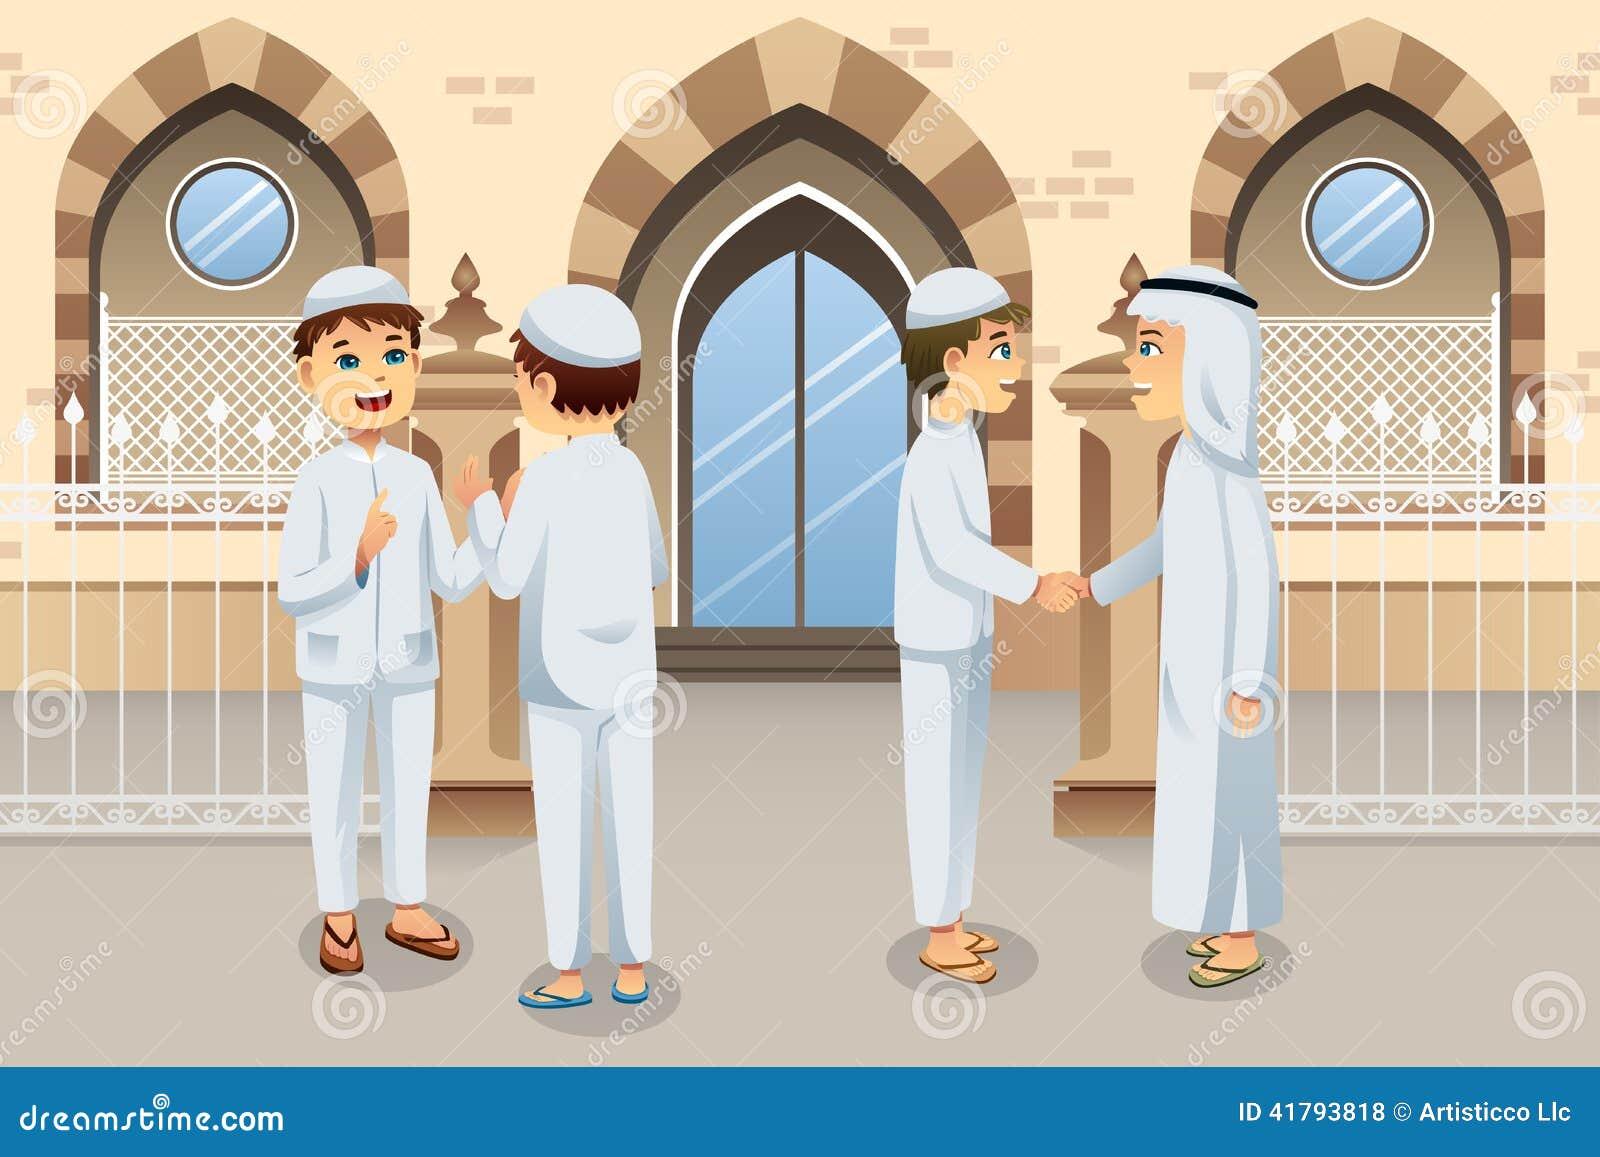 People Celebrating Eid-Al-fitr Stock Vector - Image: 41793818